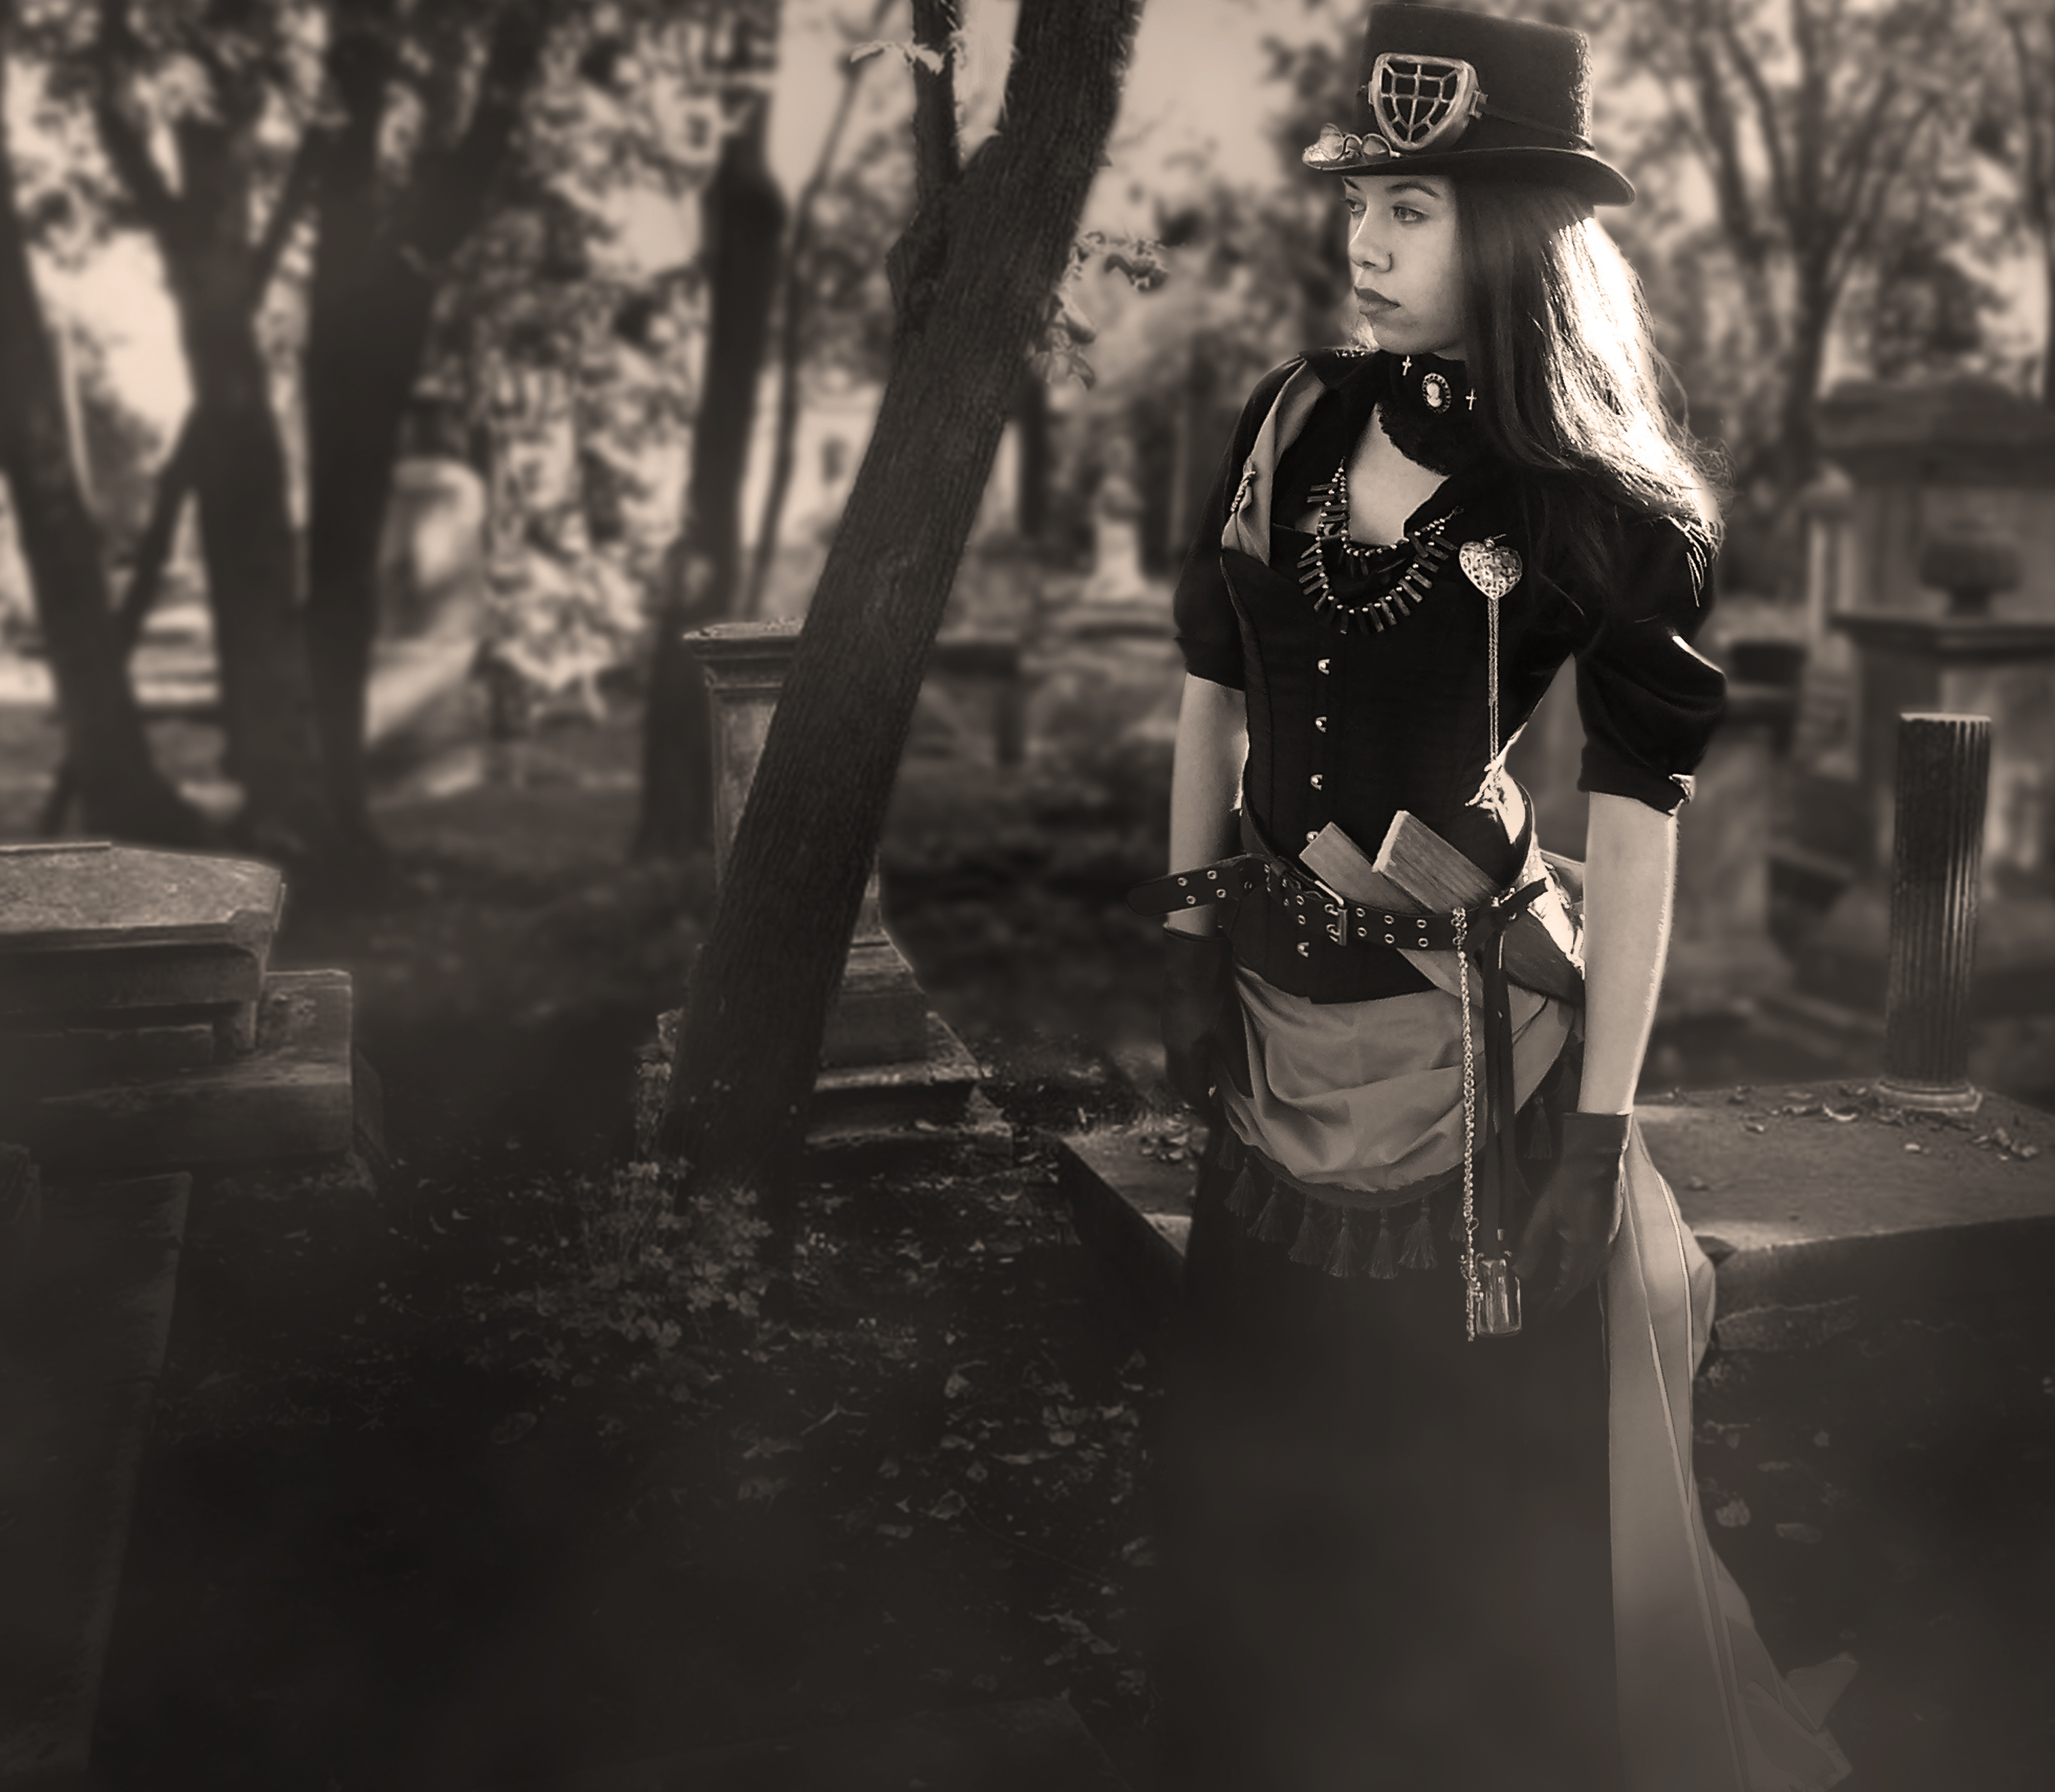 Steampunk Vampire Huntress III by NovelPashion